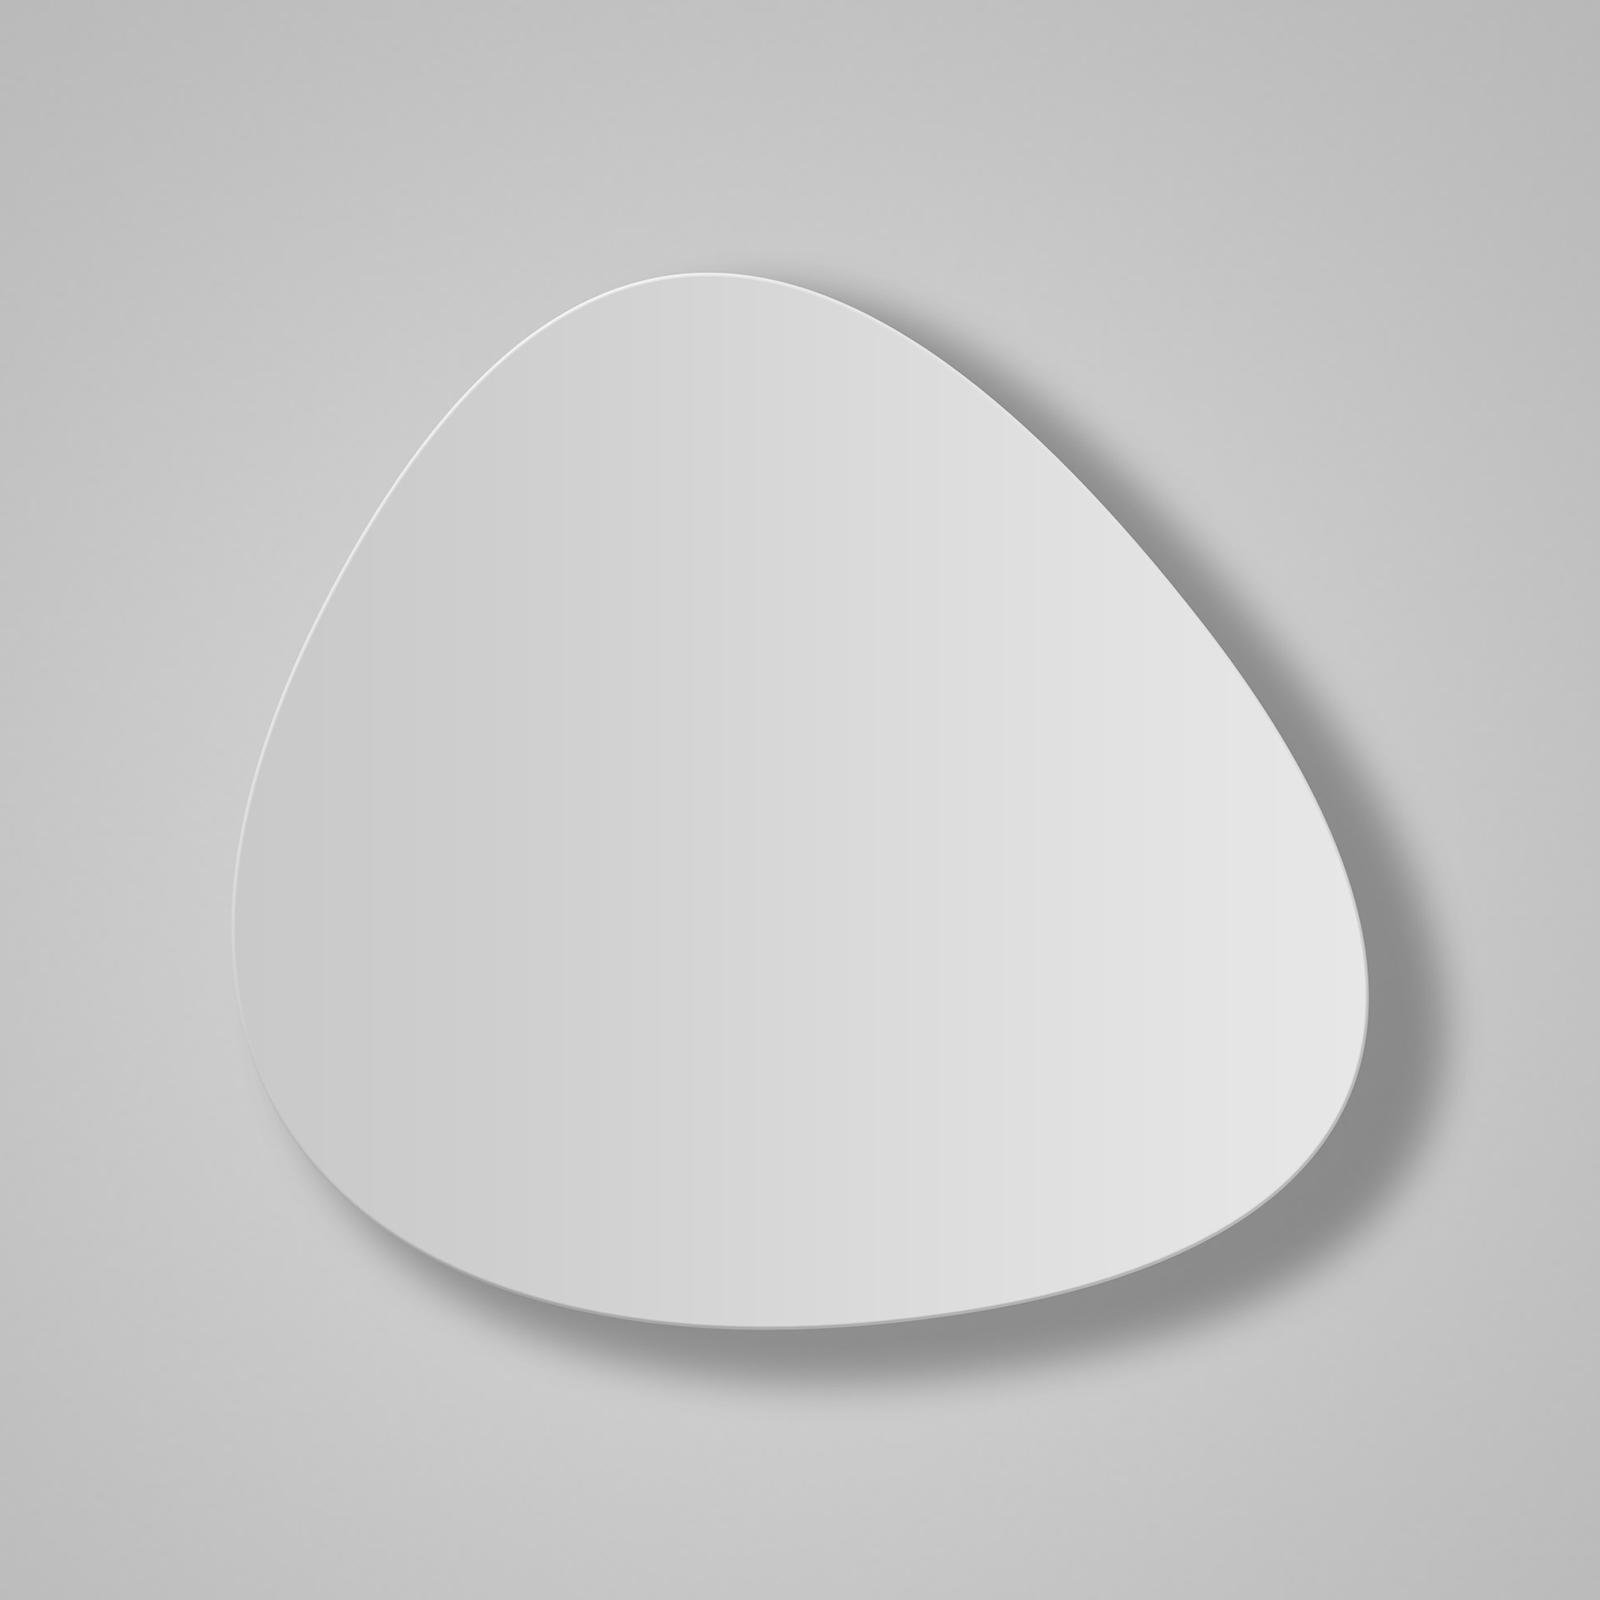 Bover Tria 03 LED wandlamp, wit, 29 cm